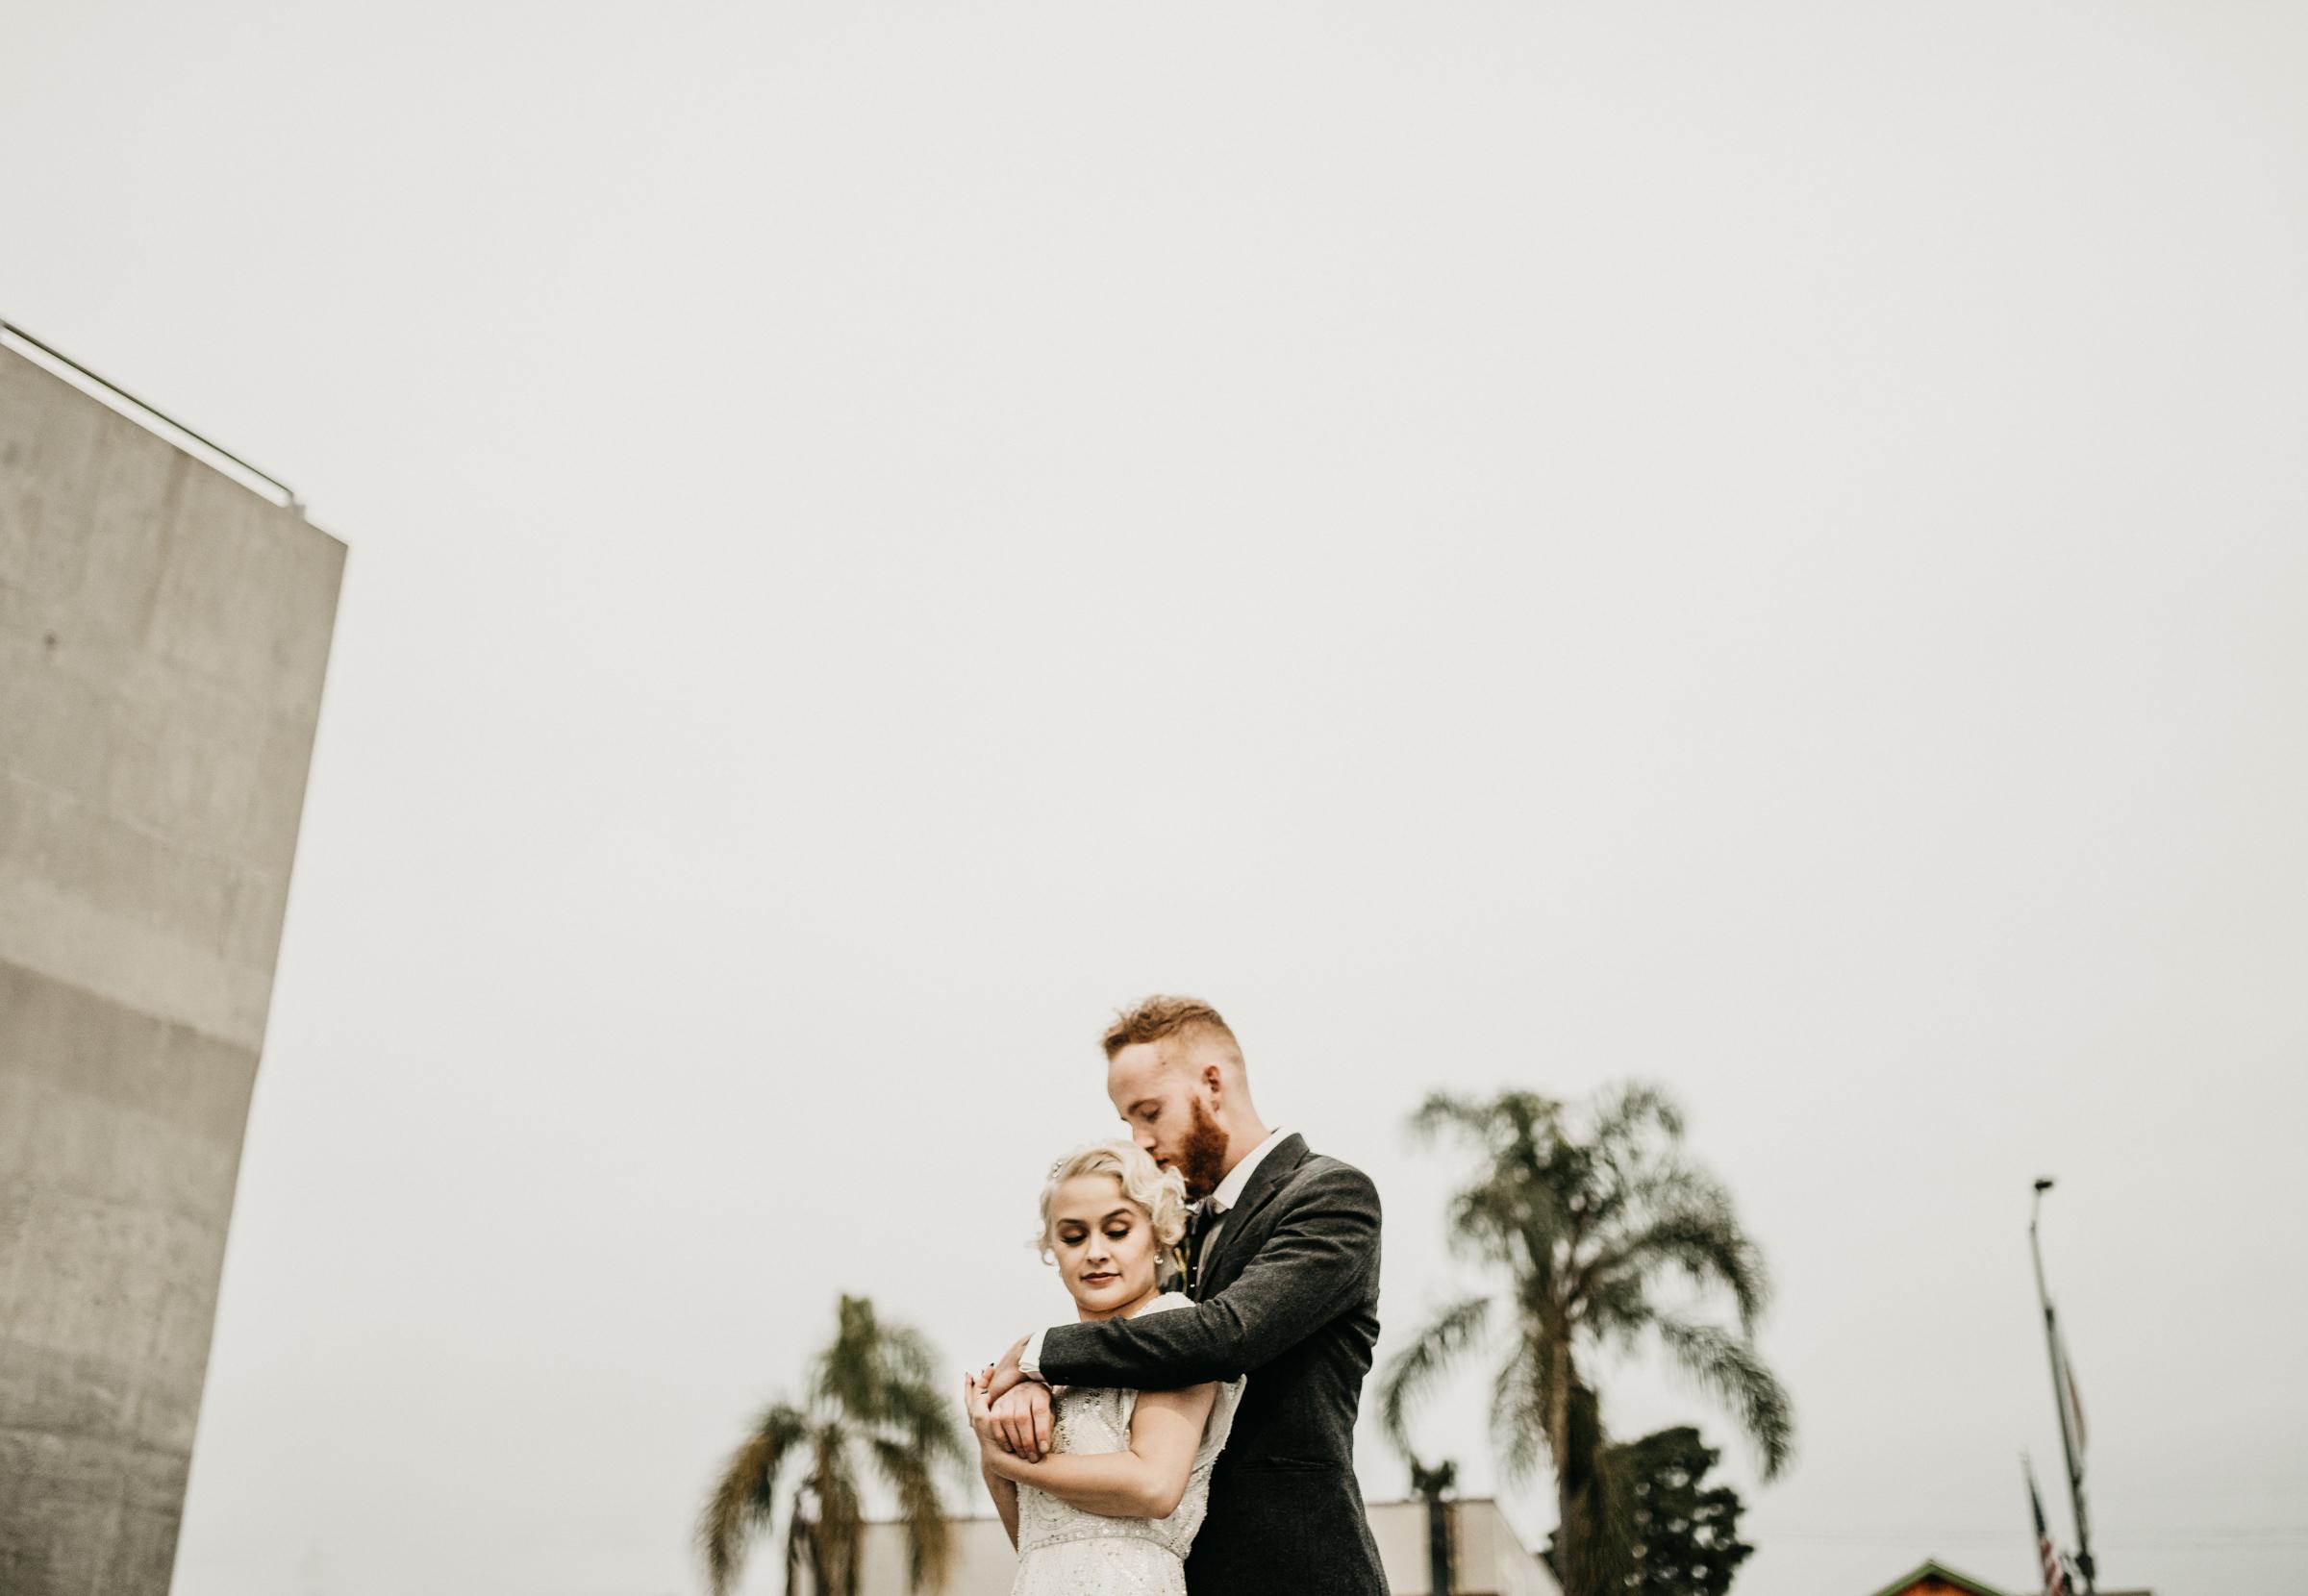 ©Isaiah + Taylor Photography - Studio 11 Wedding, Los Angeles Wedding Photographer-142.jpg